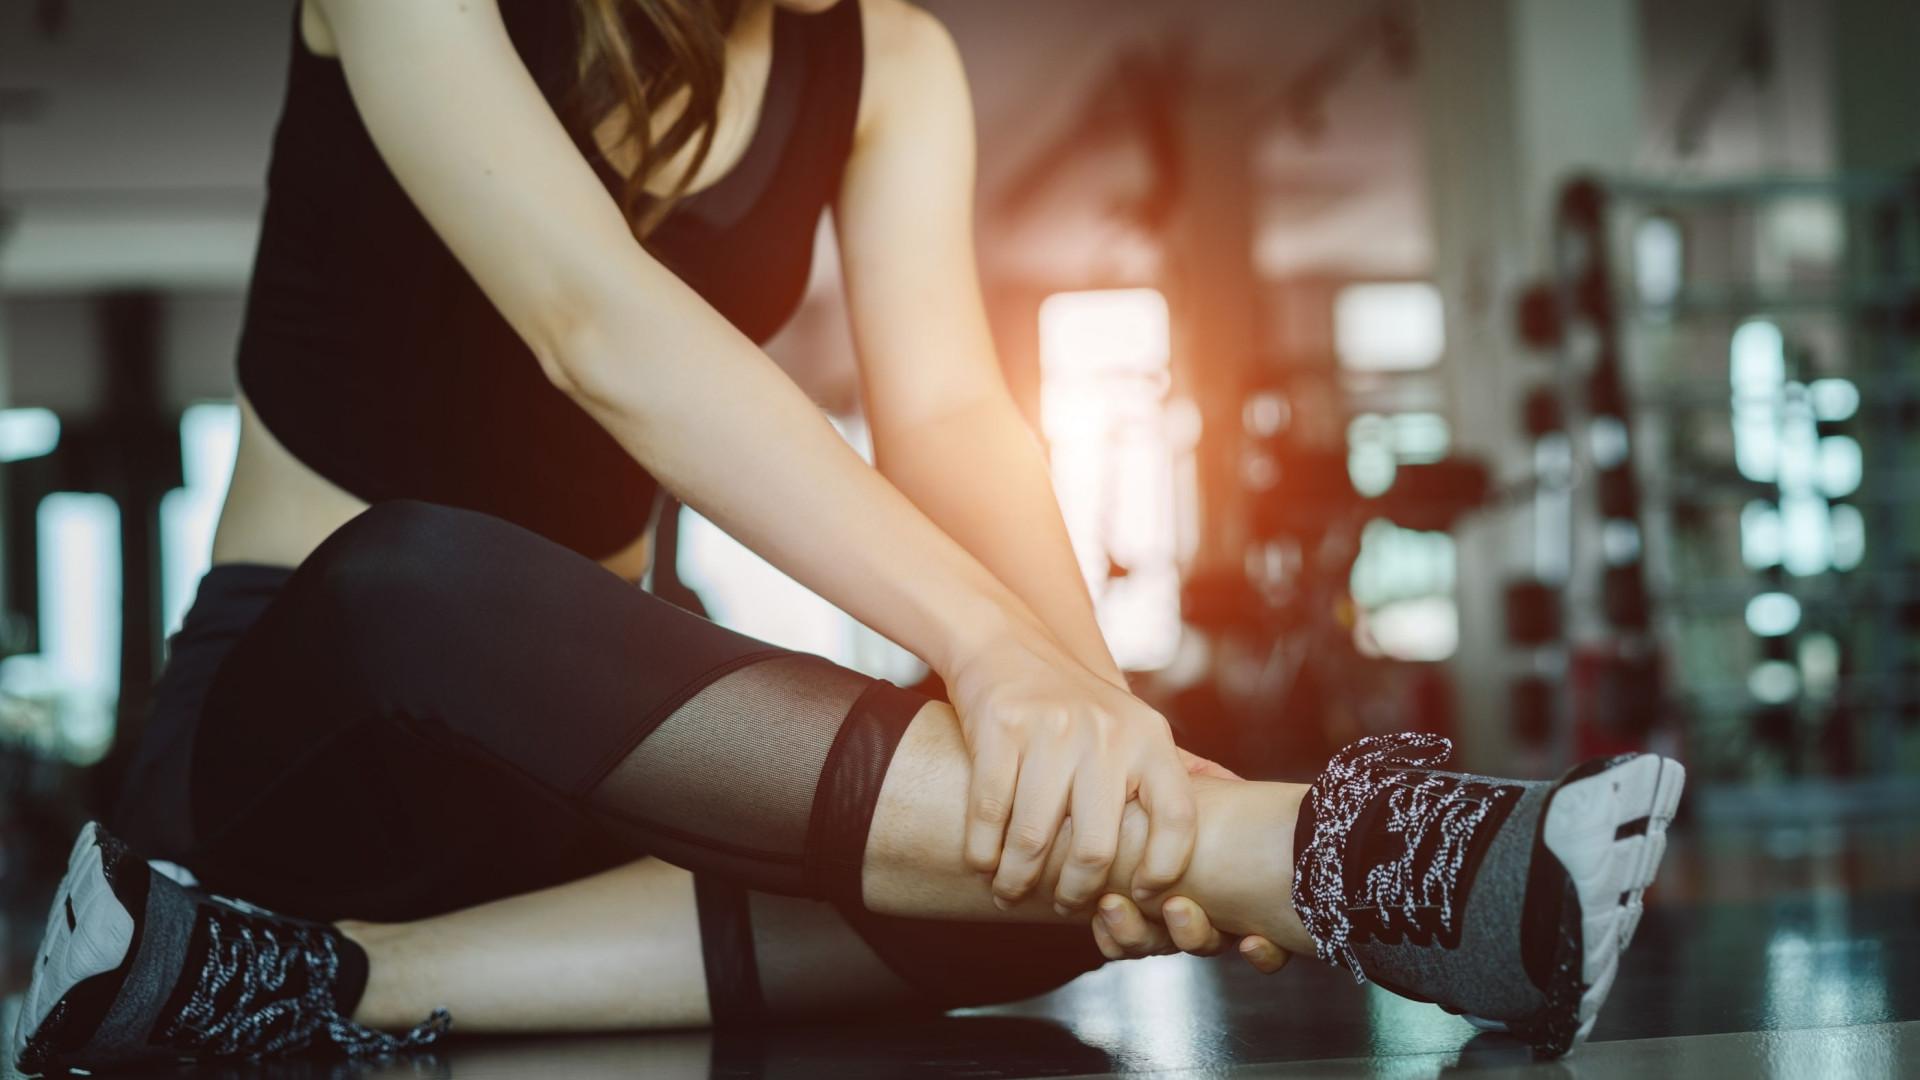 Dores musculares pós treino? Eis como as reduzir ao máximo